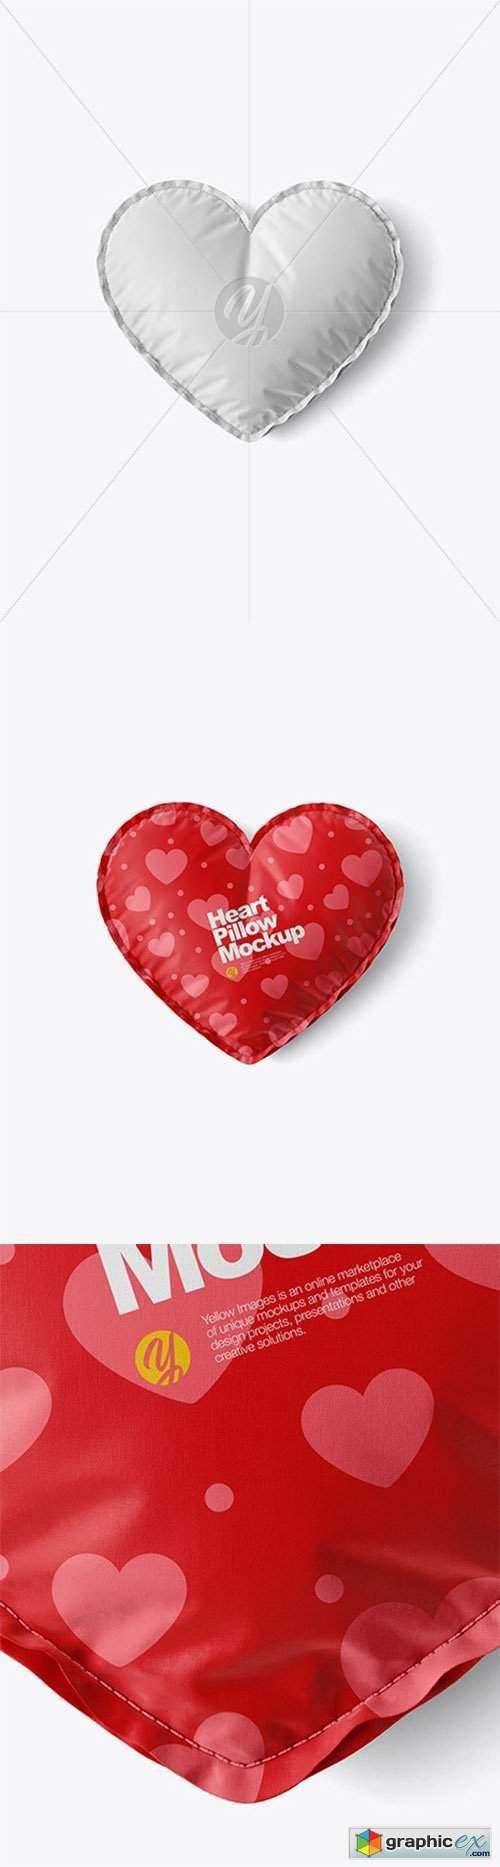 Heart Pillow Mockup - Top View